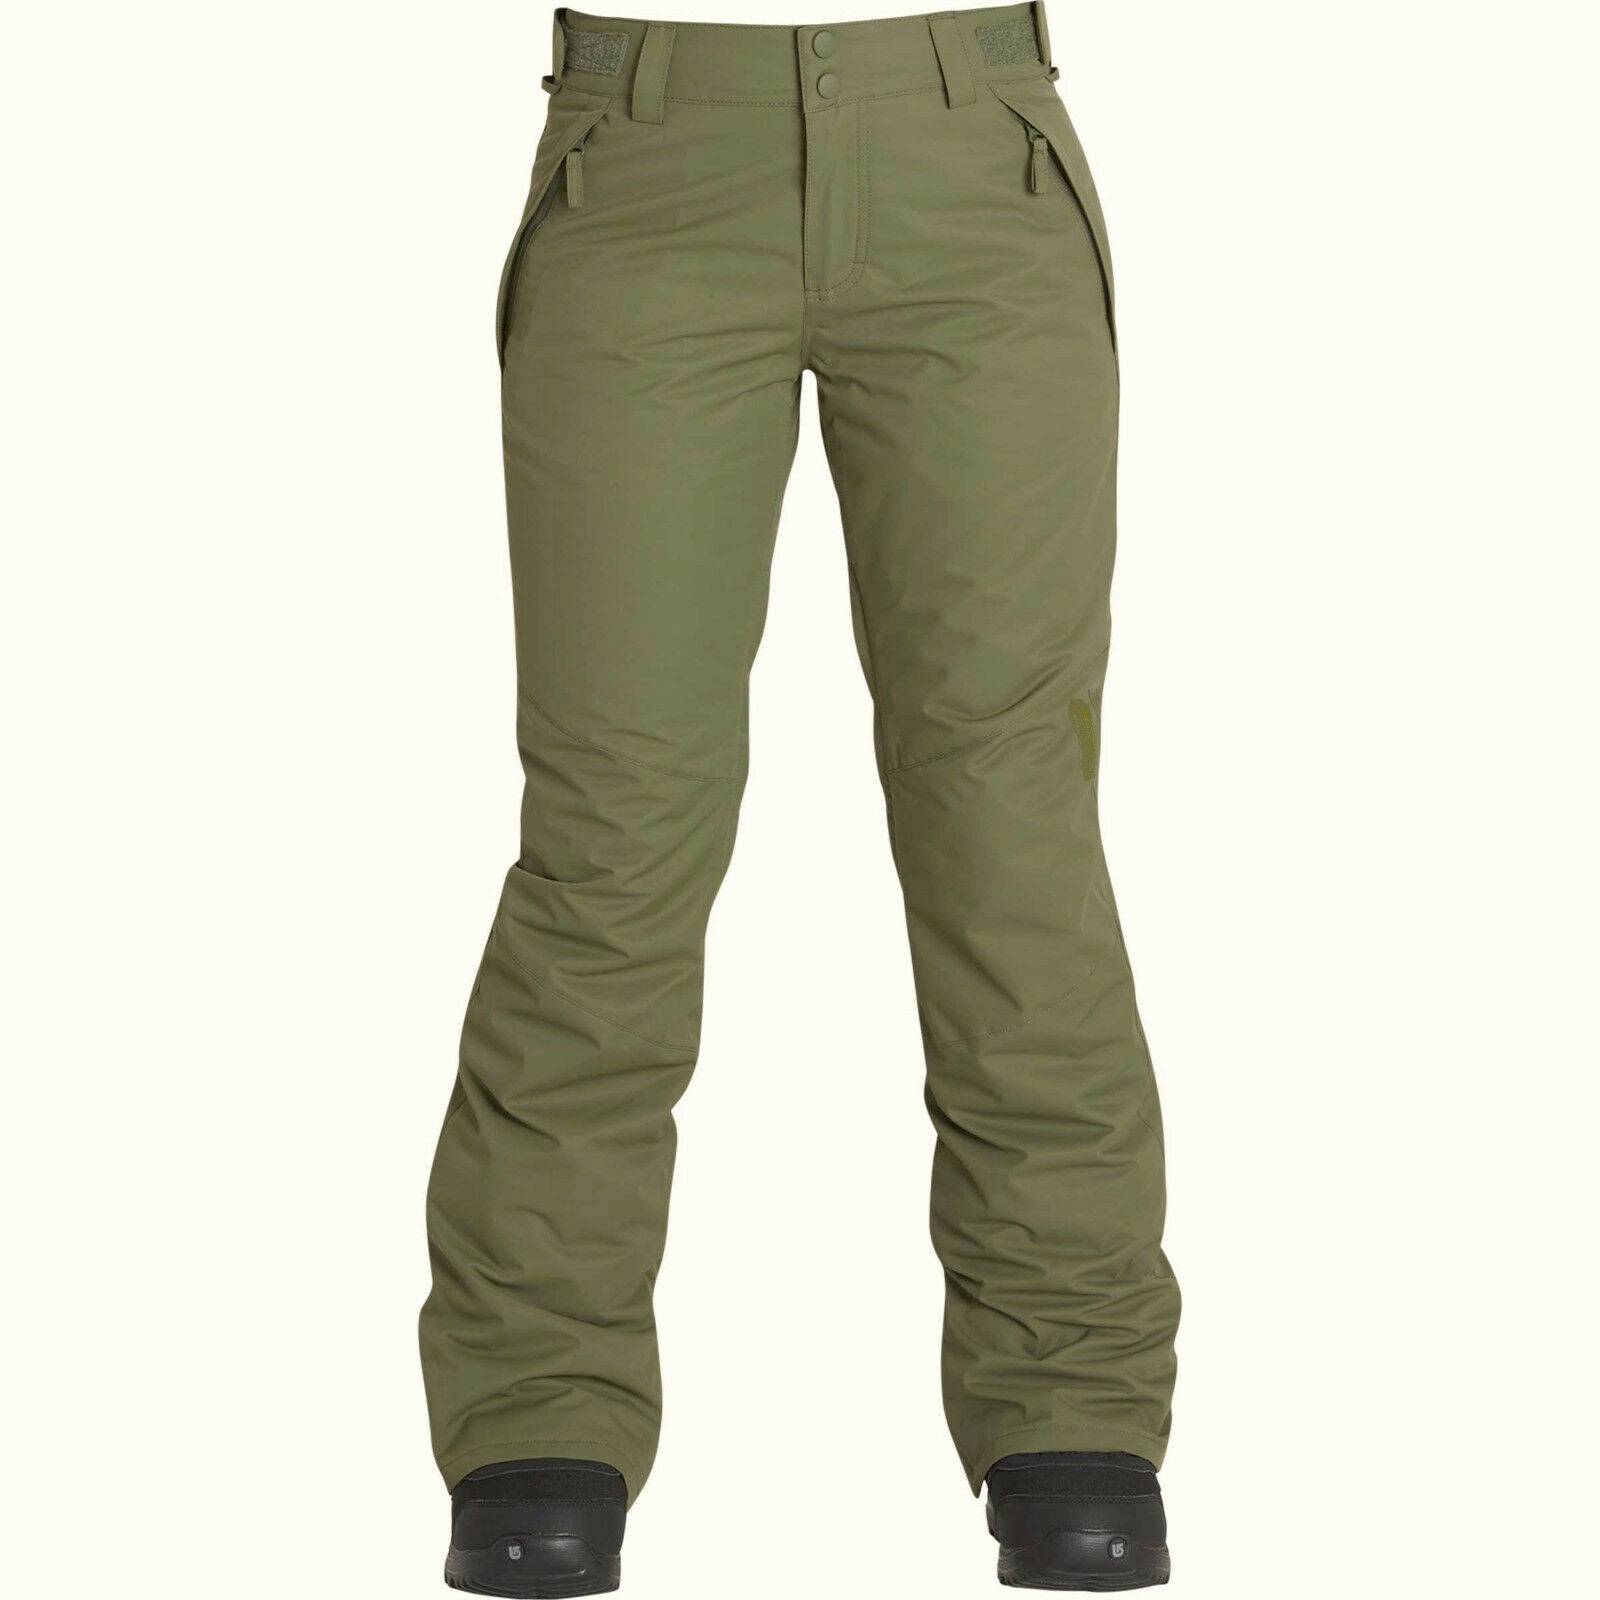 BILLABONG Women's MALLA Snow Pants  - CTN - XLarge - NWT  with 60% off discount